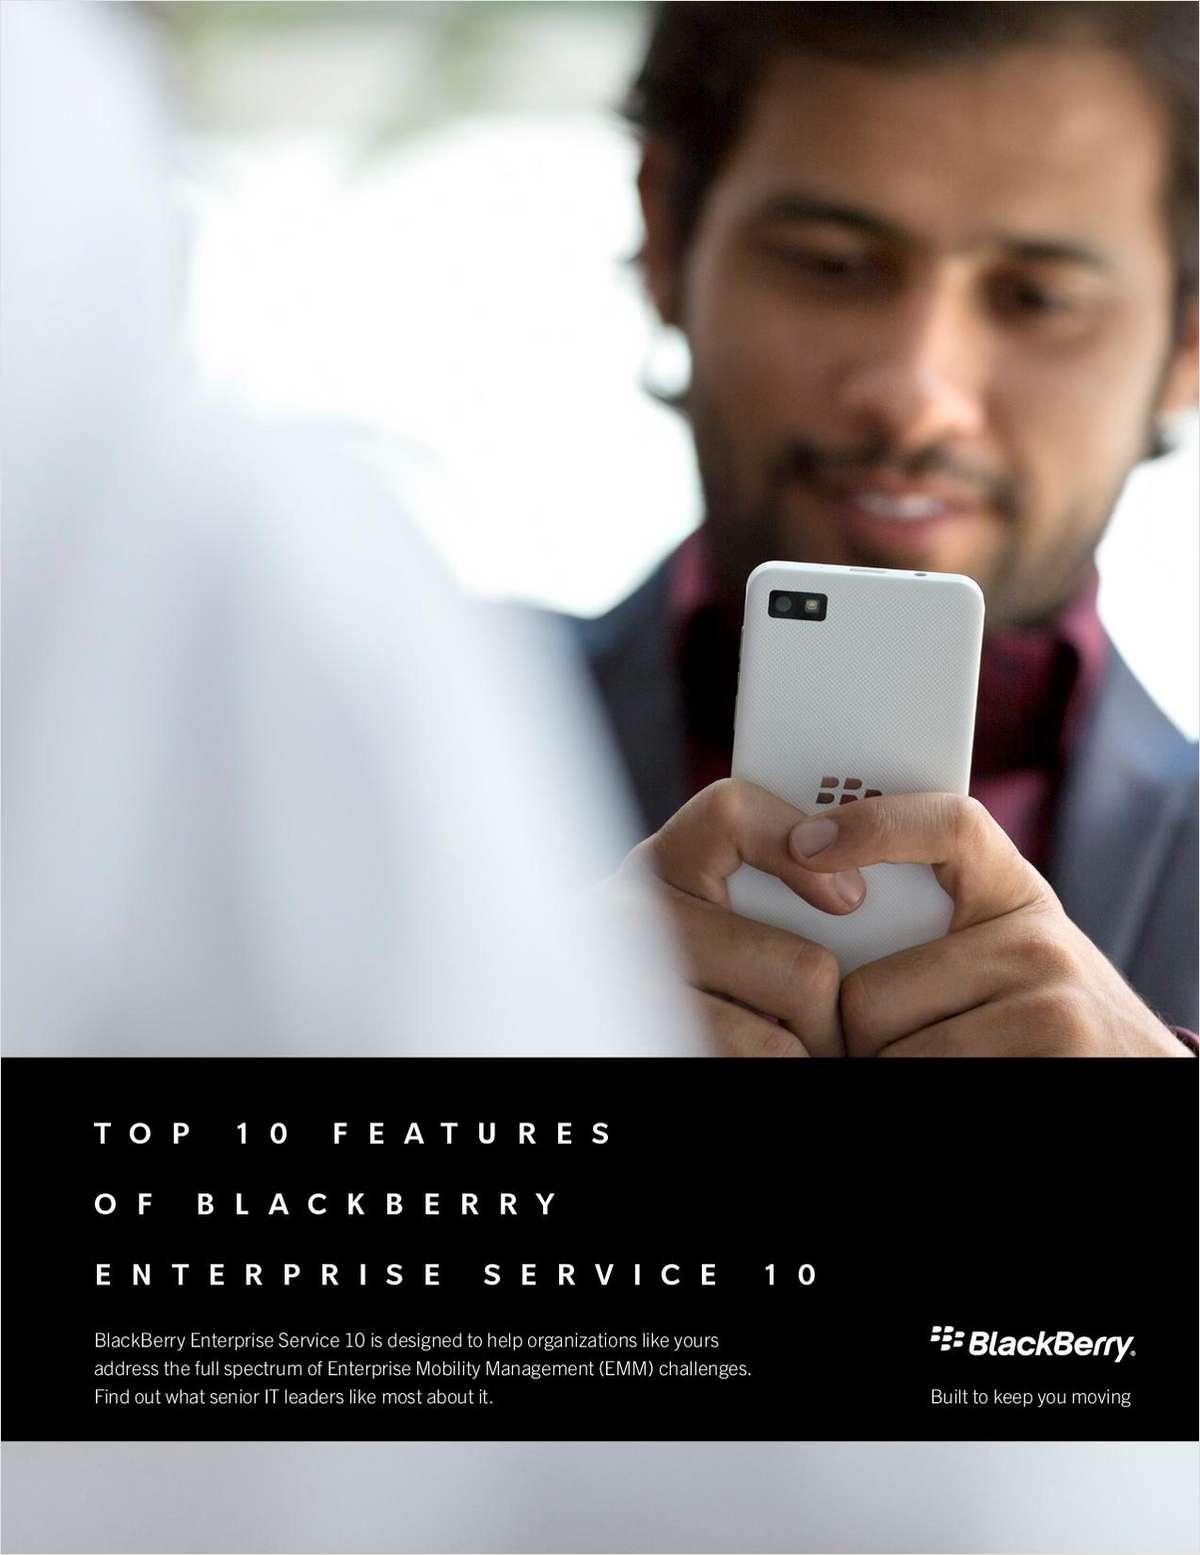 Top 10 Features of BlackBerry Enterprise Service 10